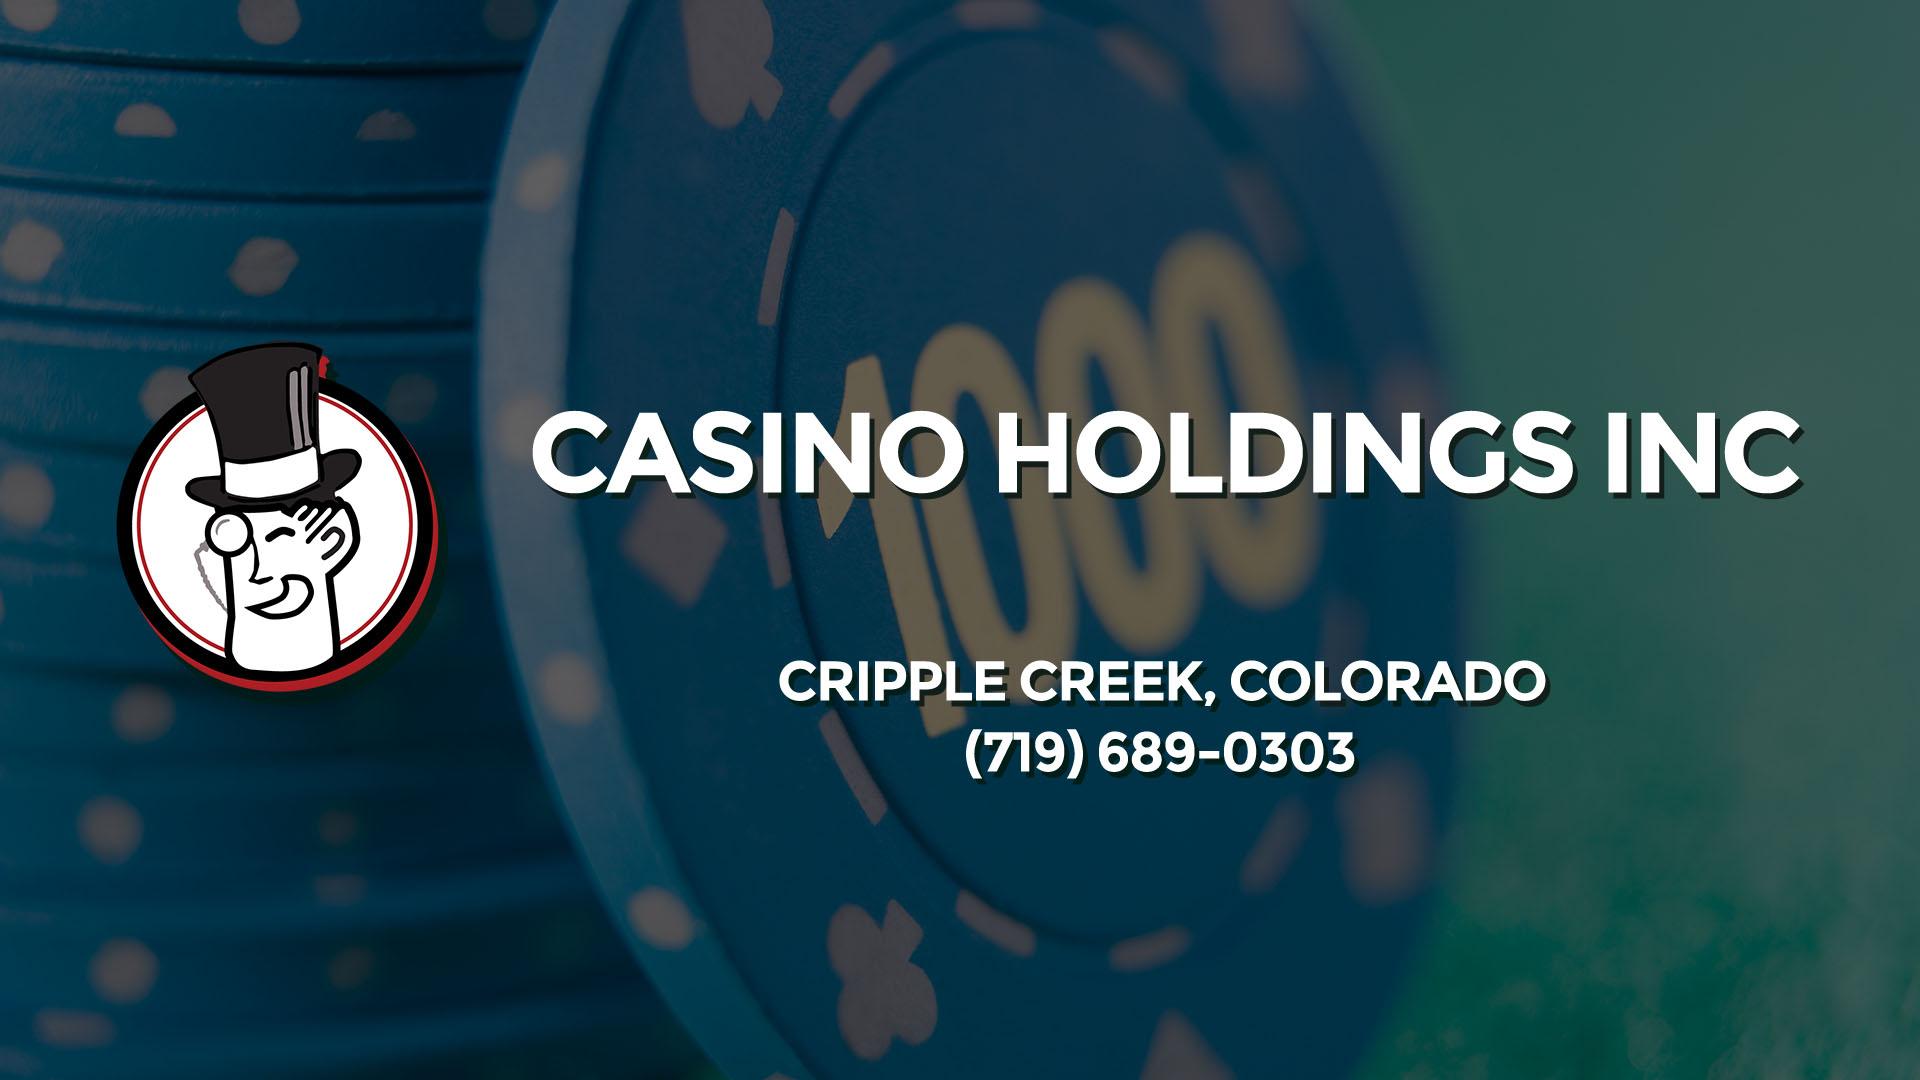 Casino holdings inc music hall casino no deposit bonus